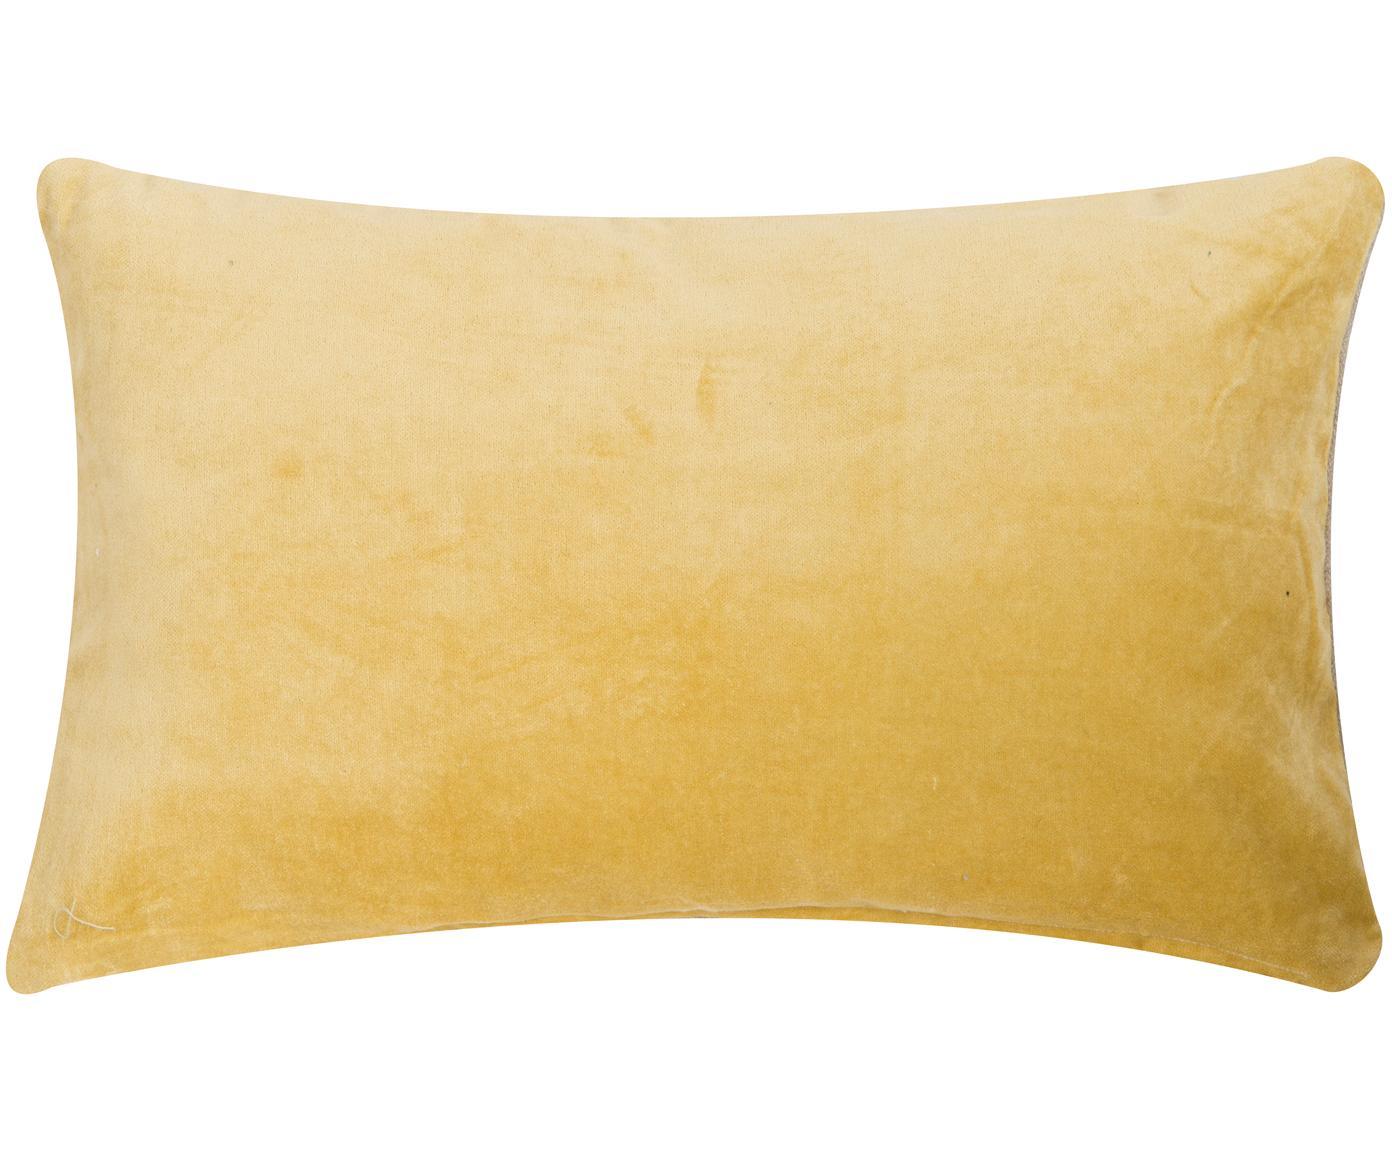 Fluwelen kussen Velvet, Geel, lichtbeige, 30 x 50 cm